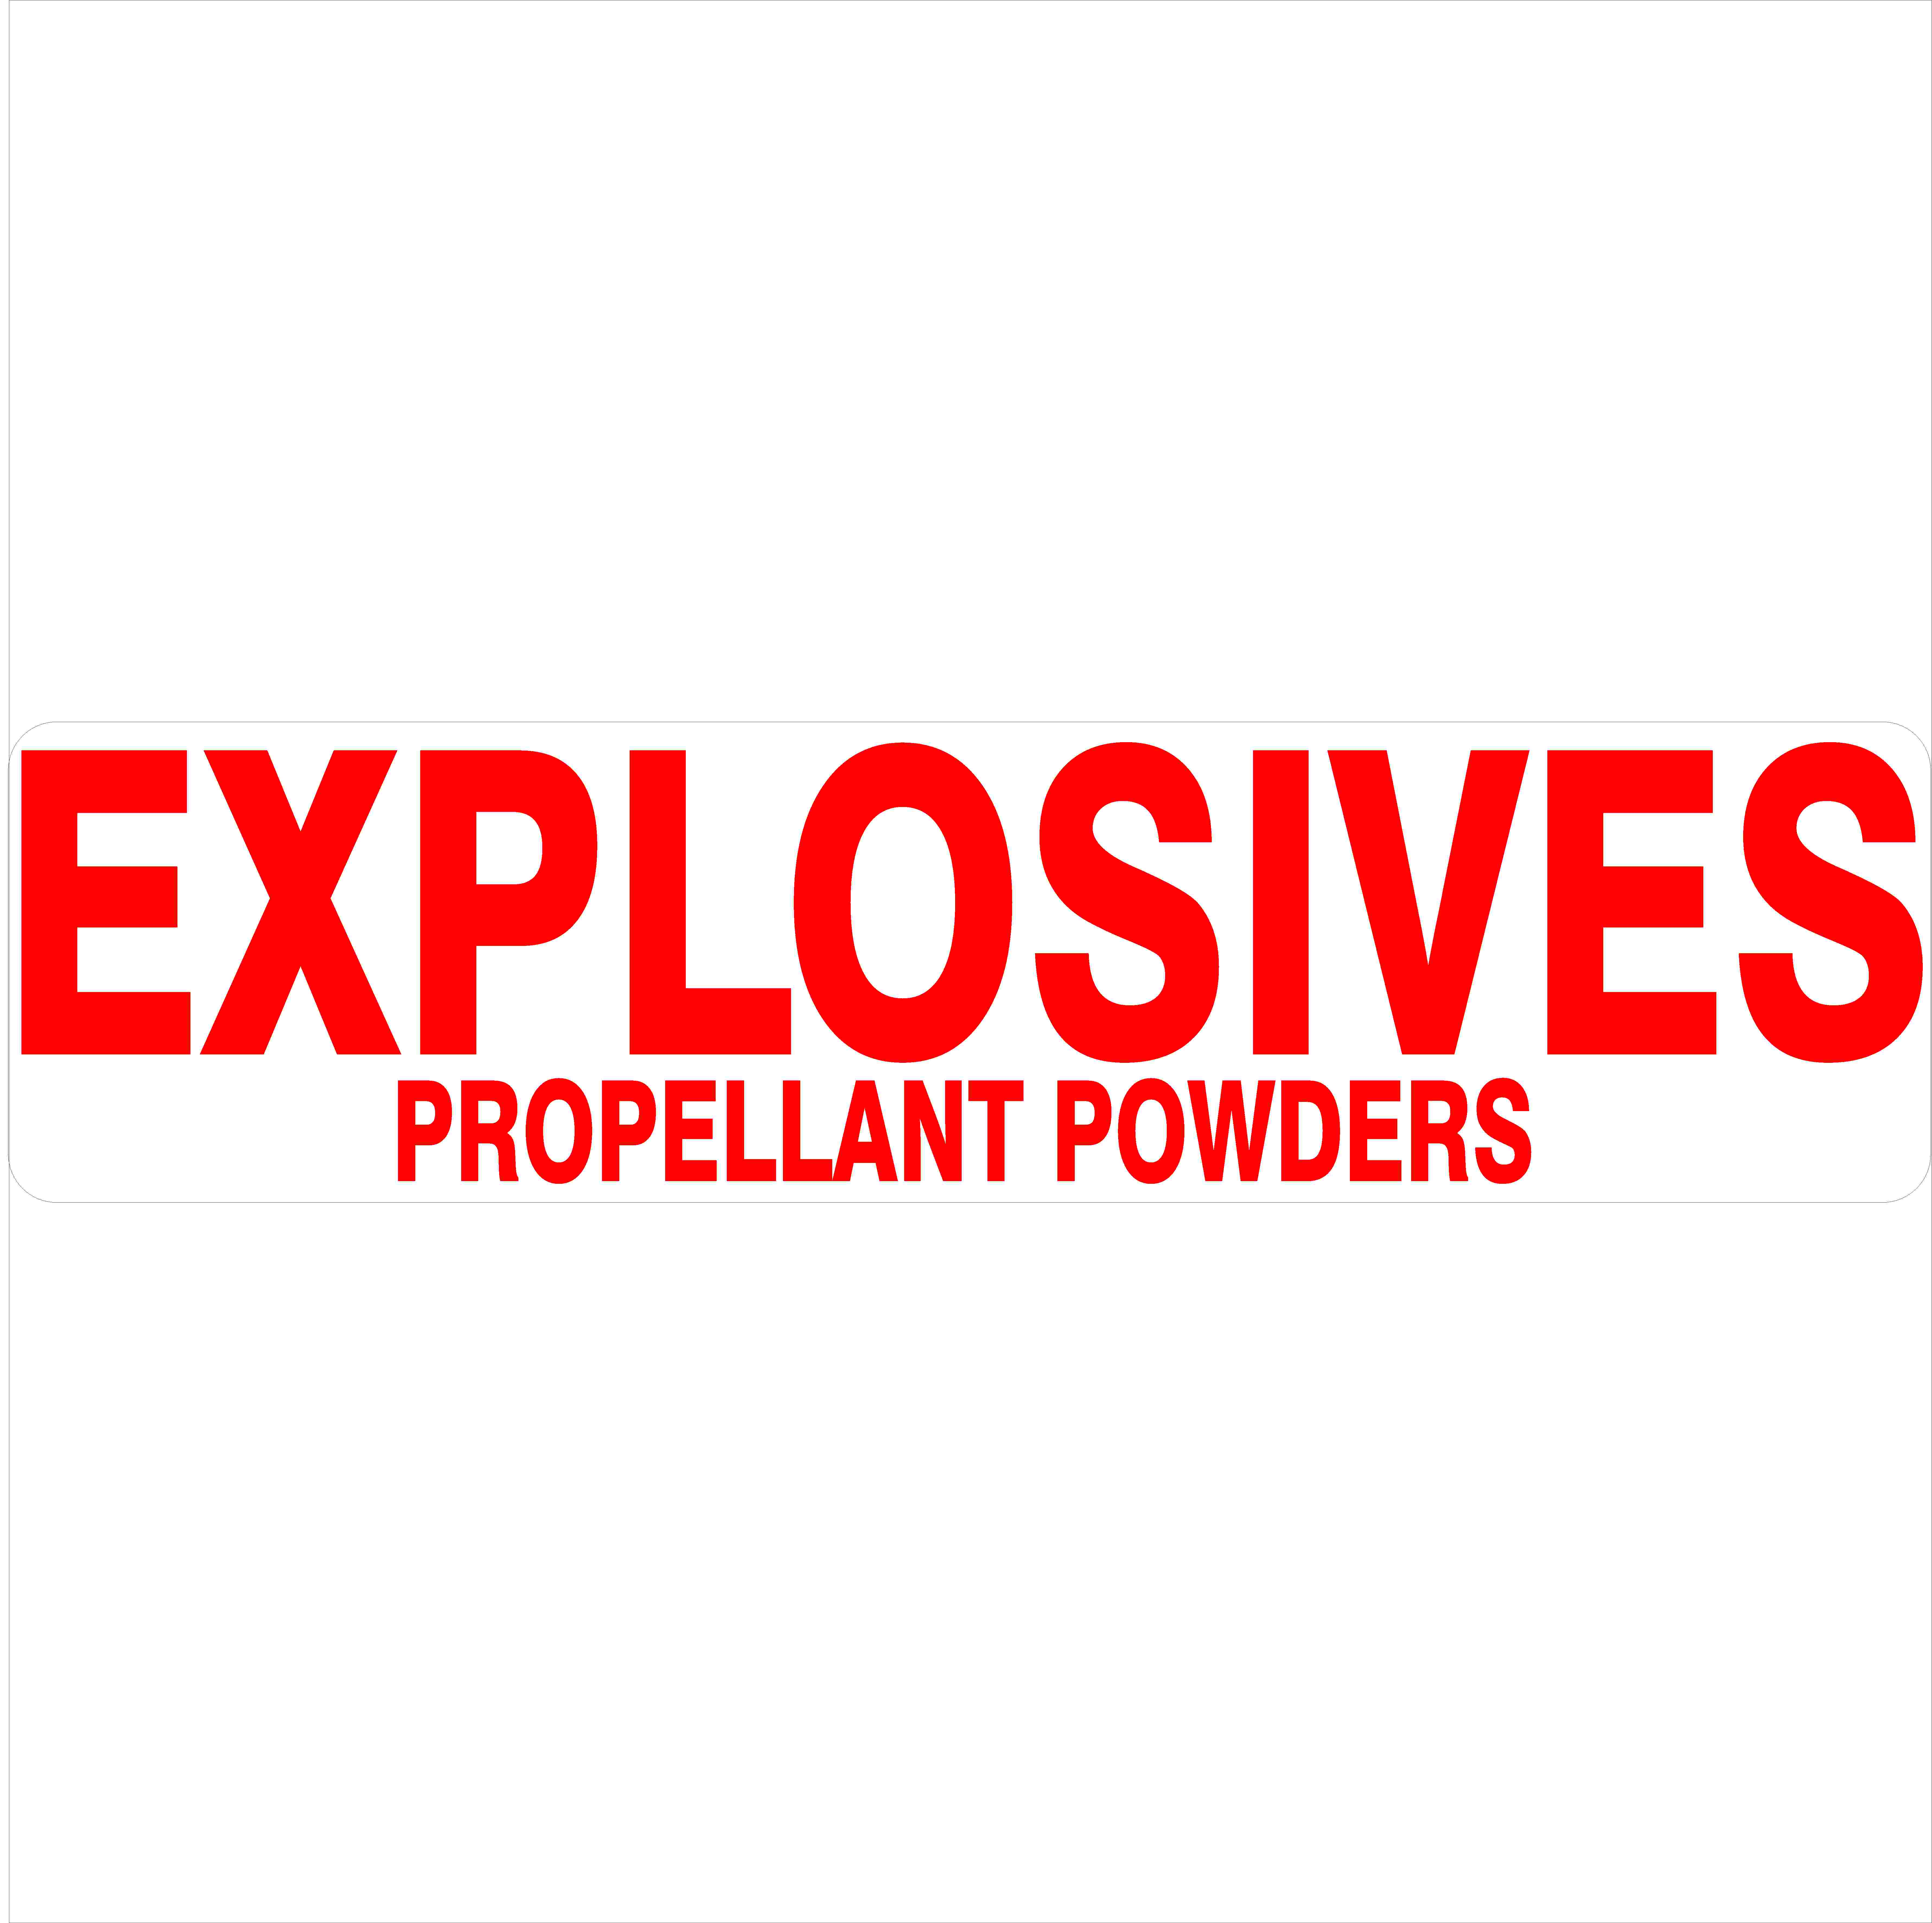 Hazchem Signs EXPLOSIVES PROPELLANT POWDERS